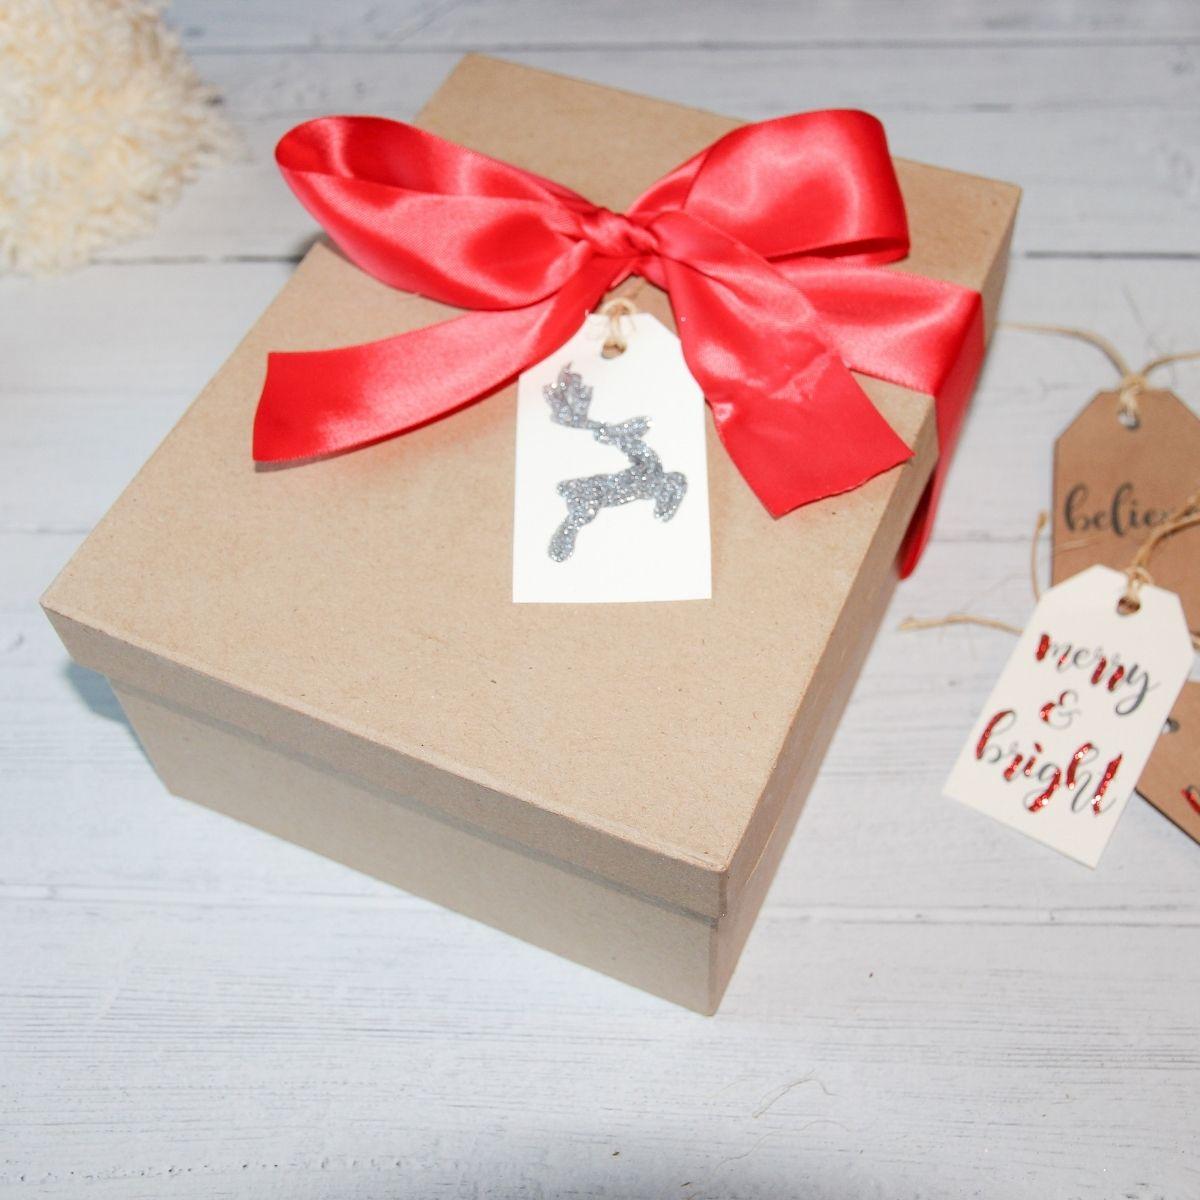 printable Christmas gift tag on a gift with a bow